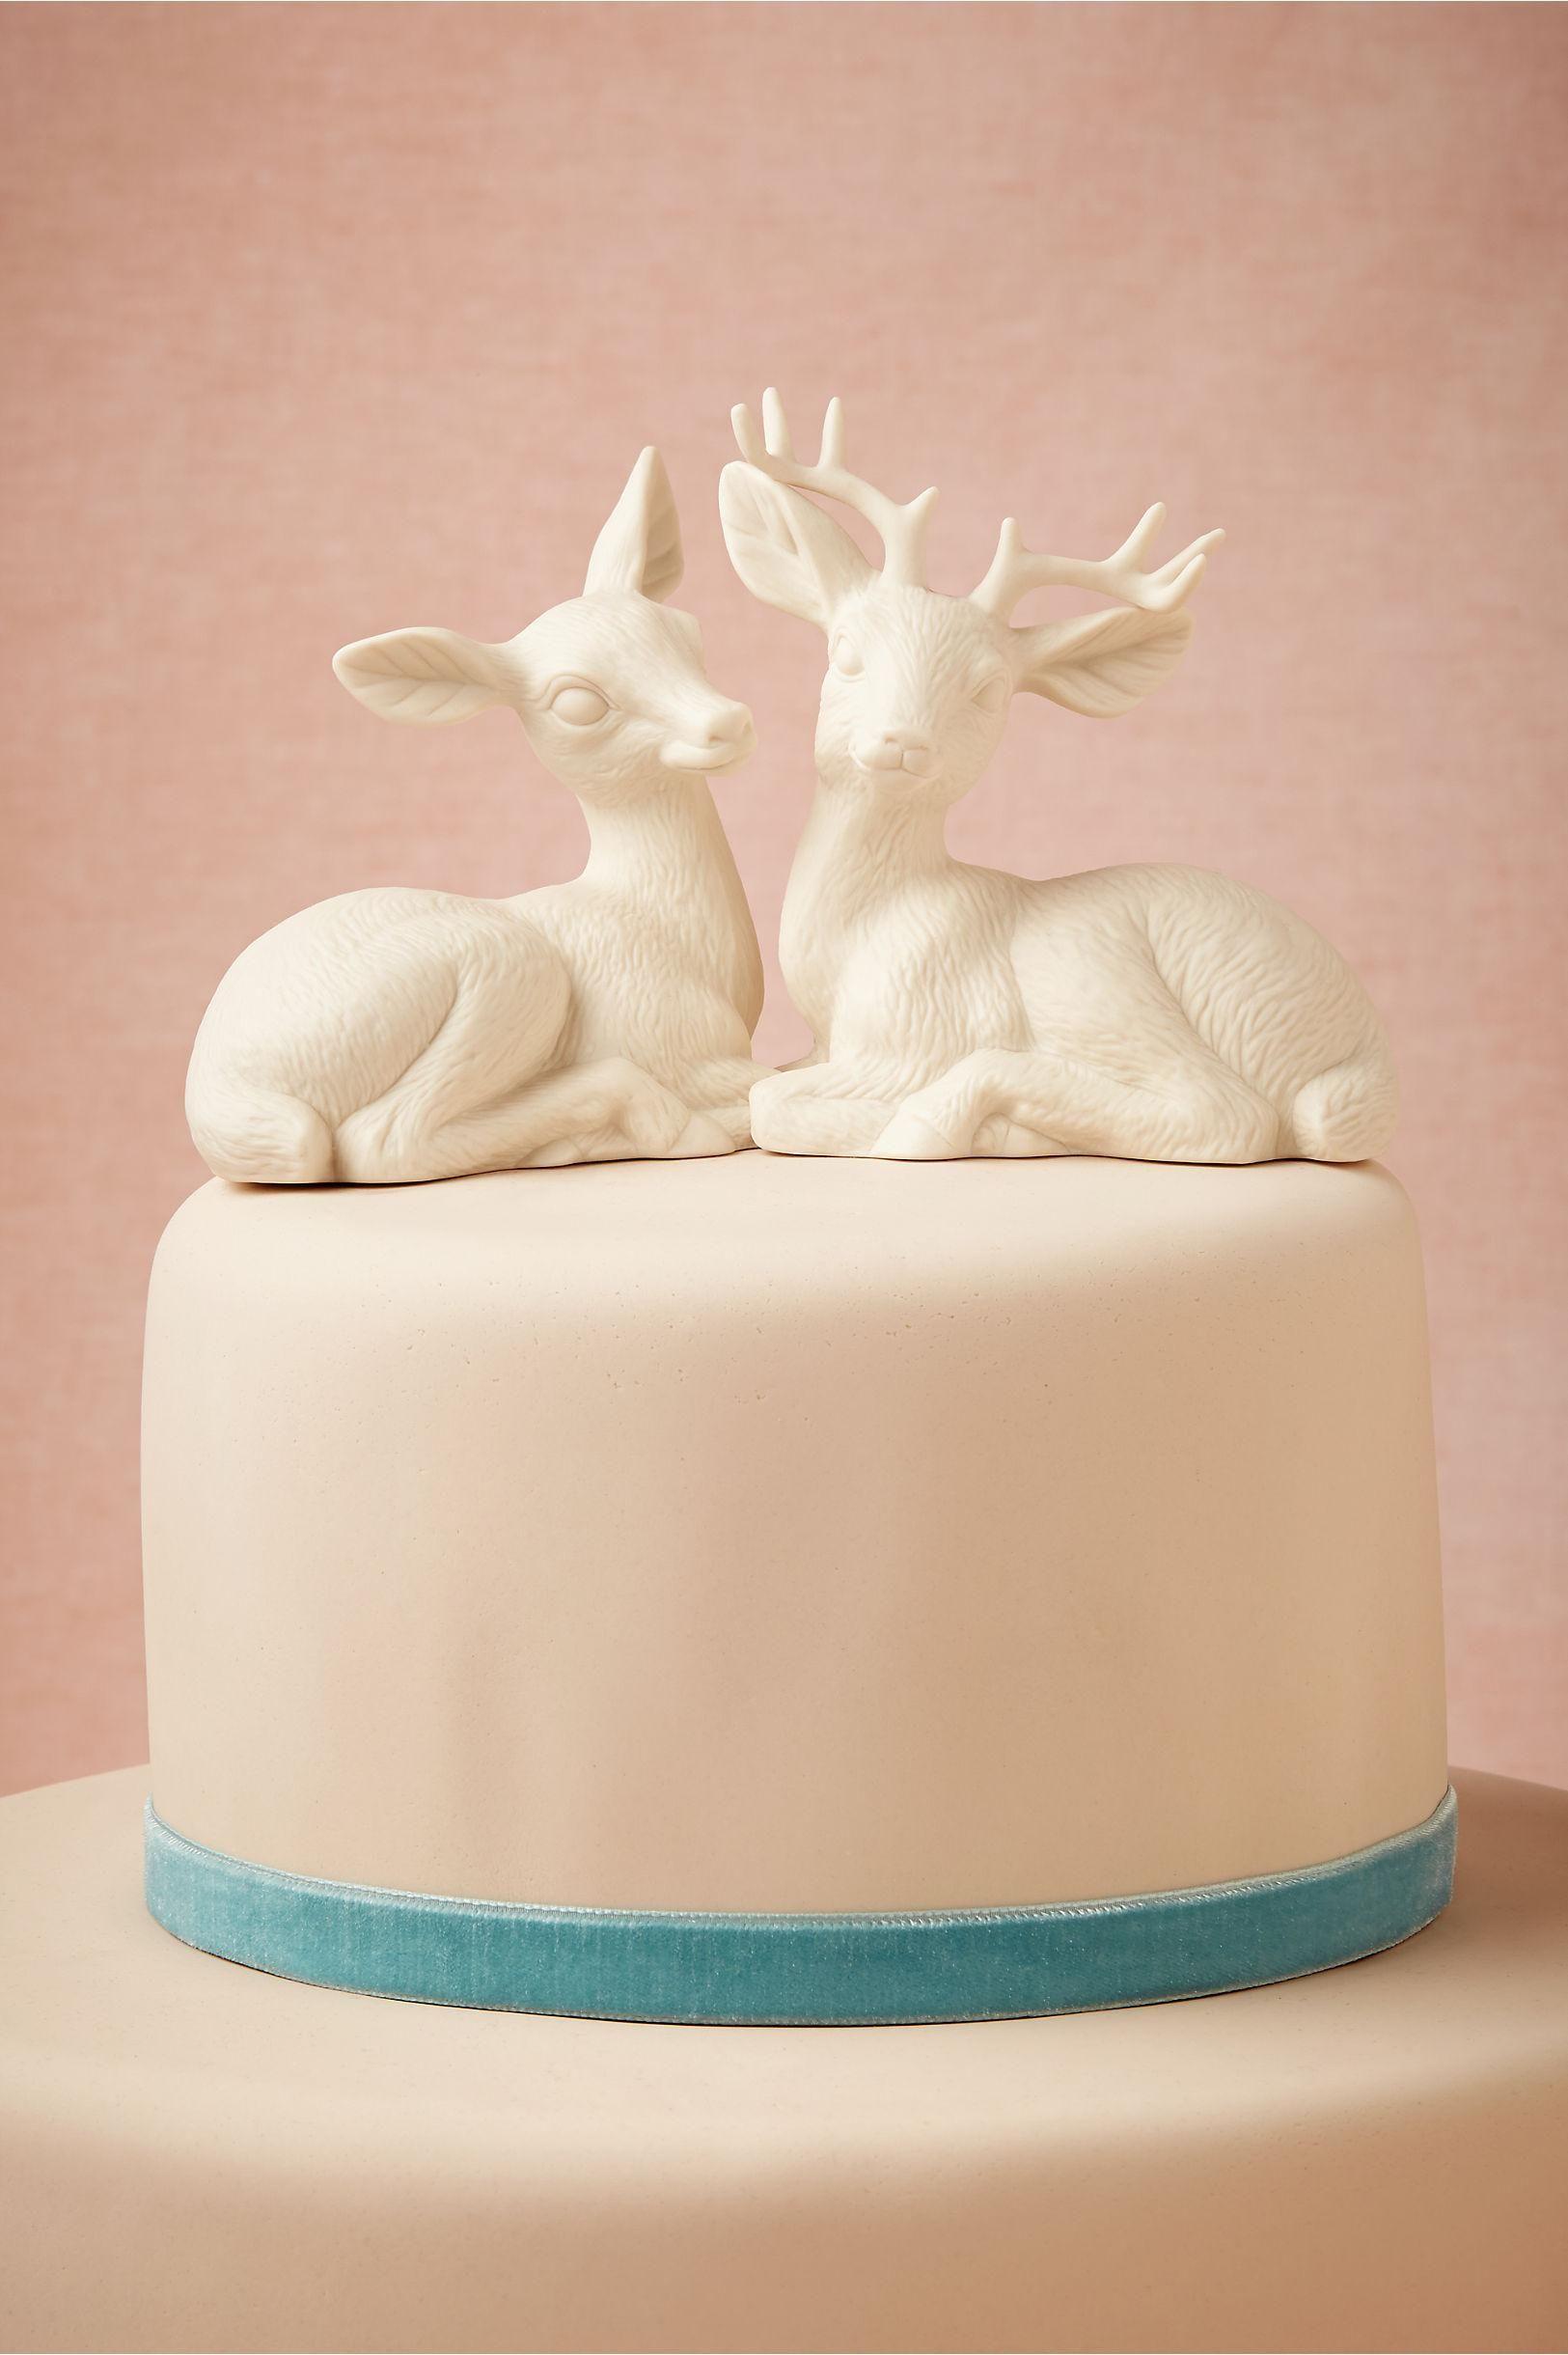 6400fc9600510 Oh Deer Cake Topper   Wedding Cakes & Dessert Tables   Wedding cake ...